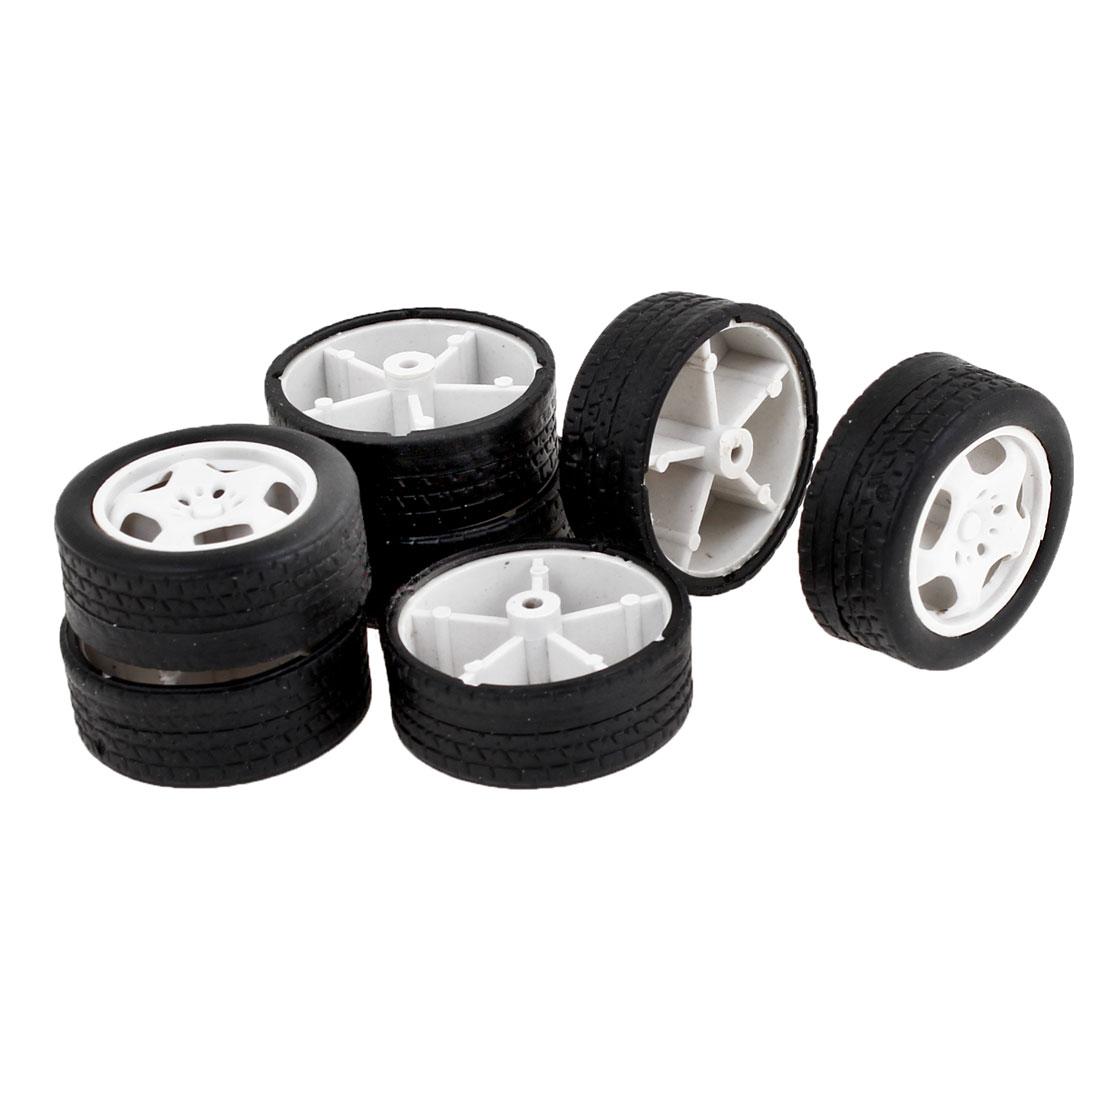 Children Toy Car Bus Truck 34mm Diameter Rubber Roll Wheels Replacement 7 Pieces